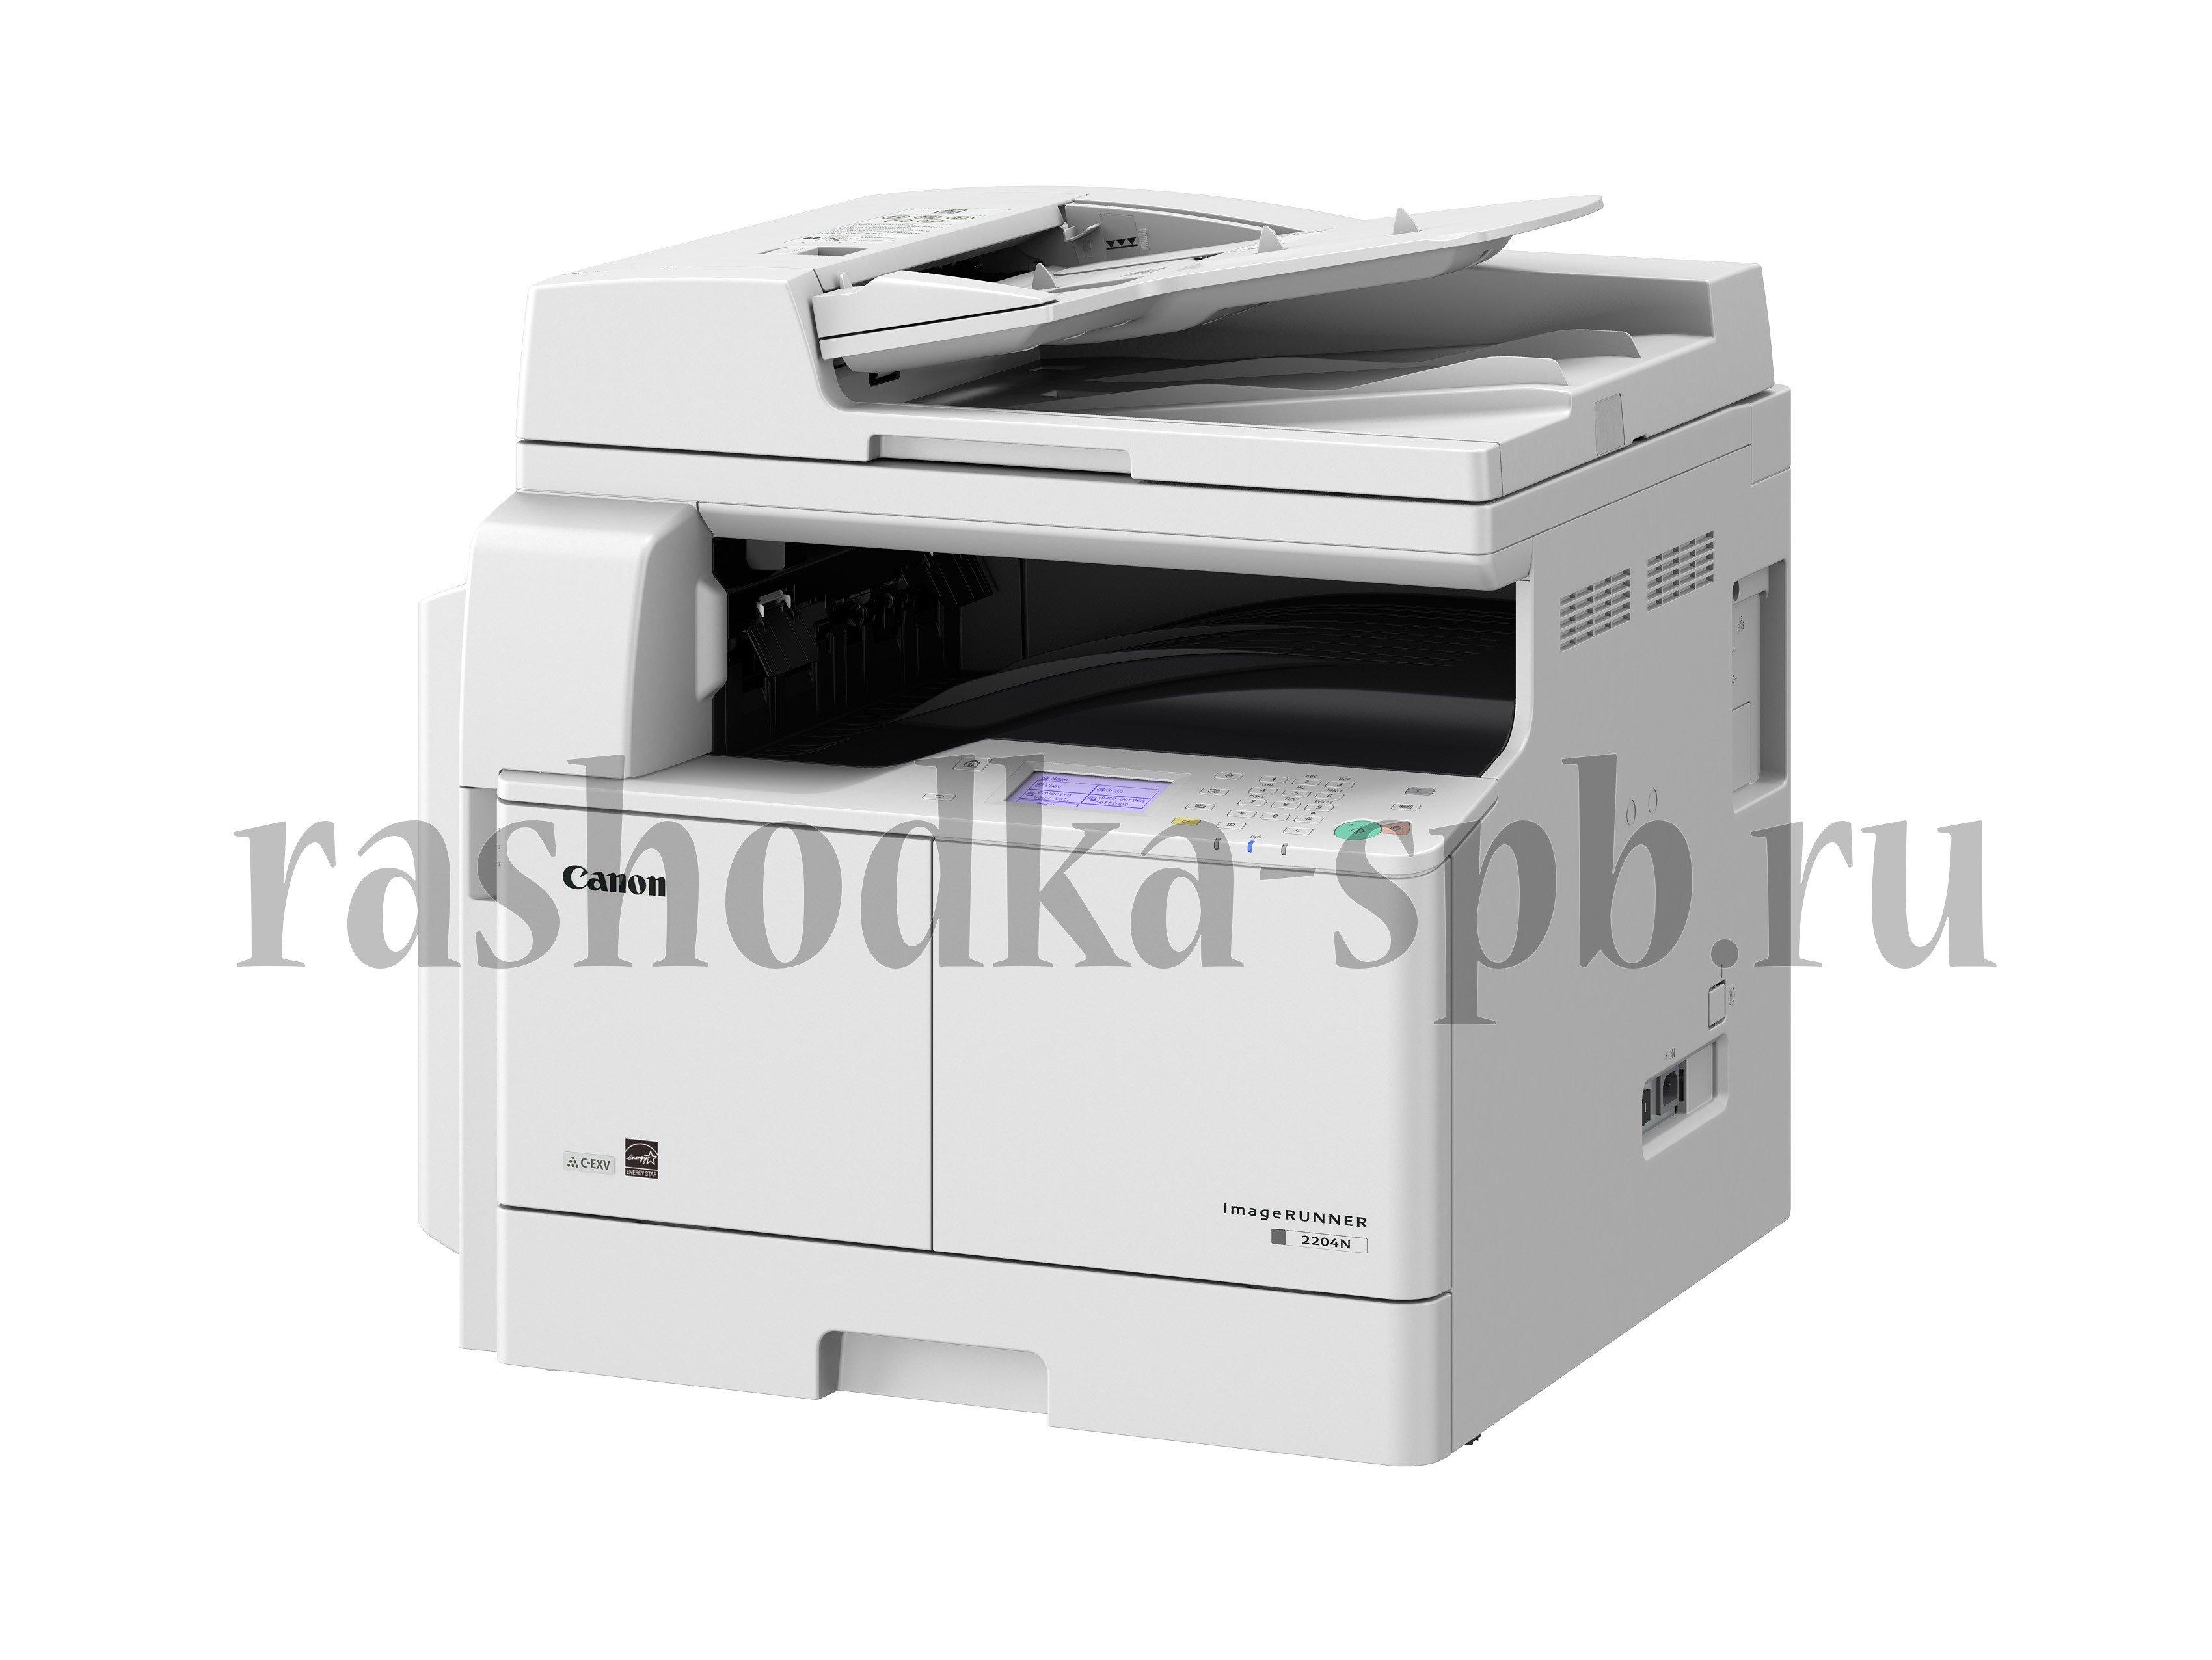 Цифровой копировальный аппарат Canon imageRUNNER 2204N MFP (А3, без тонера) (0913C004)